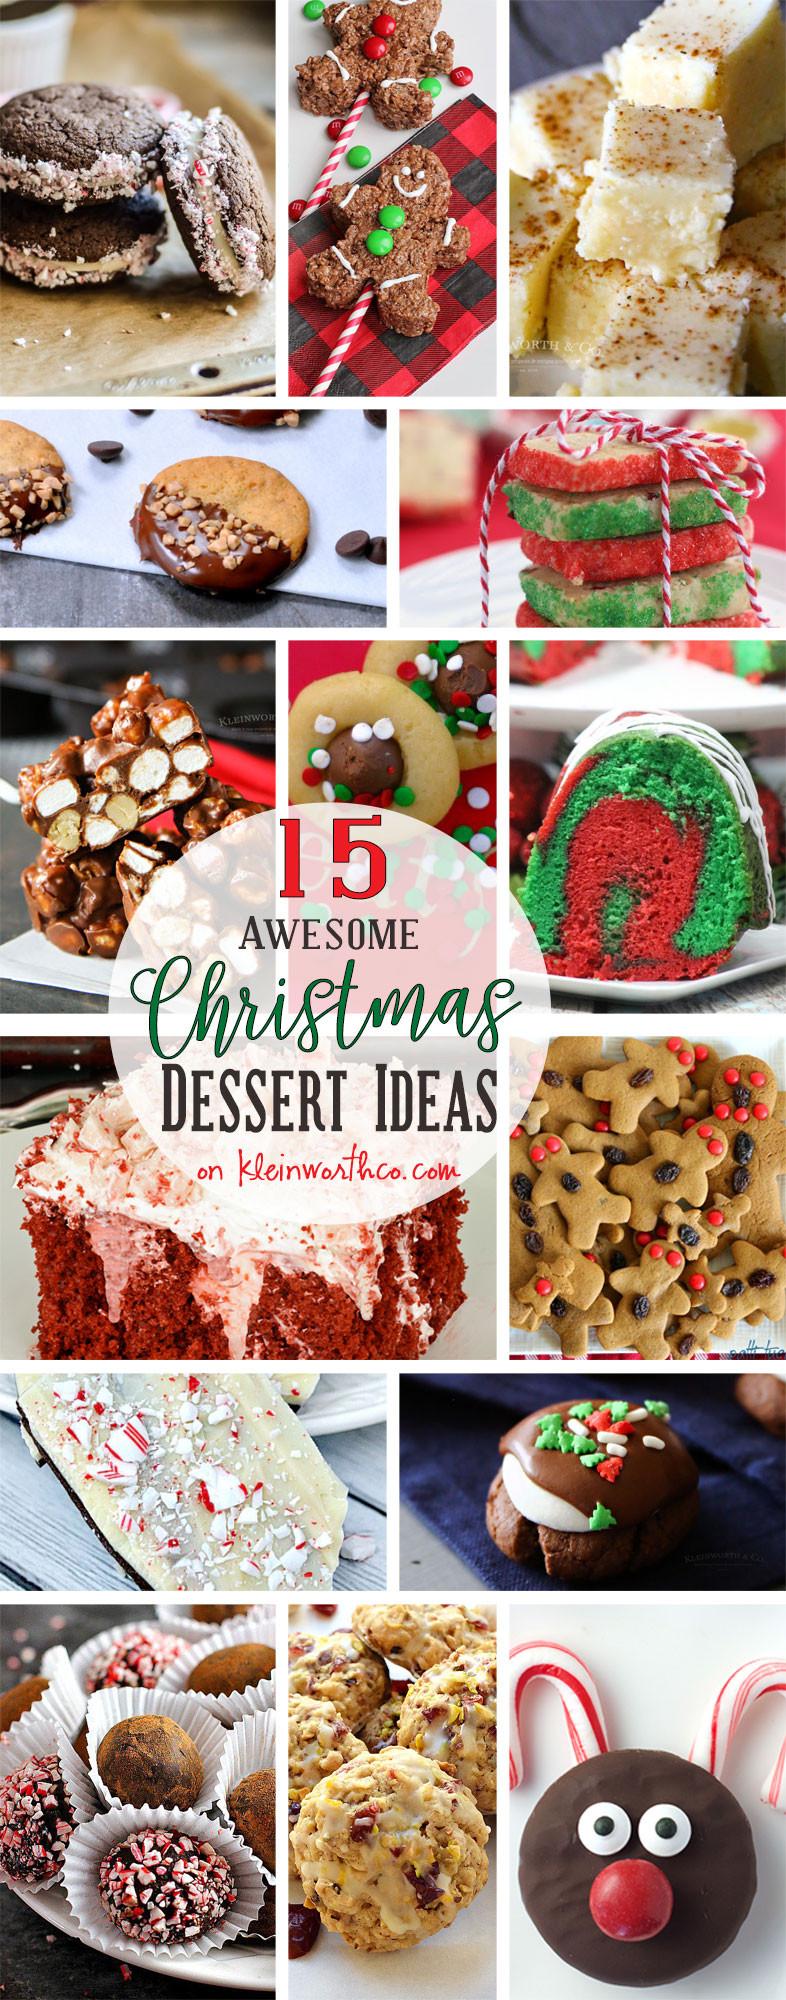 Awesome Christmas Desserts  15 AWESOME Christmas Dessert Ideas